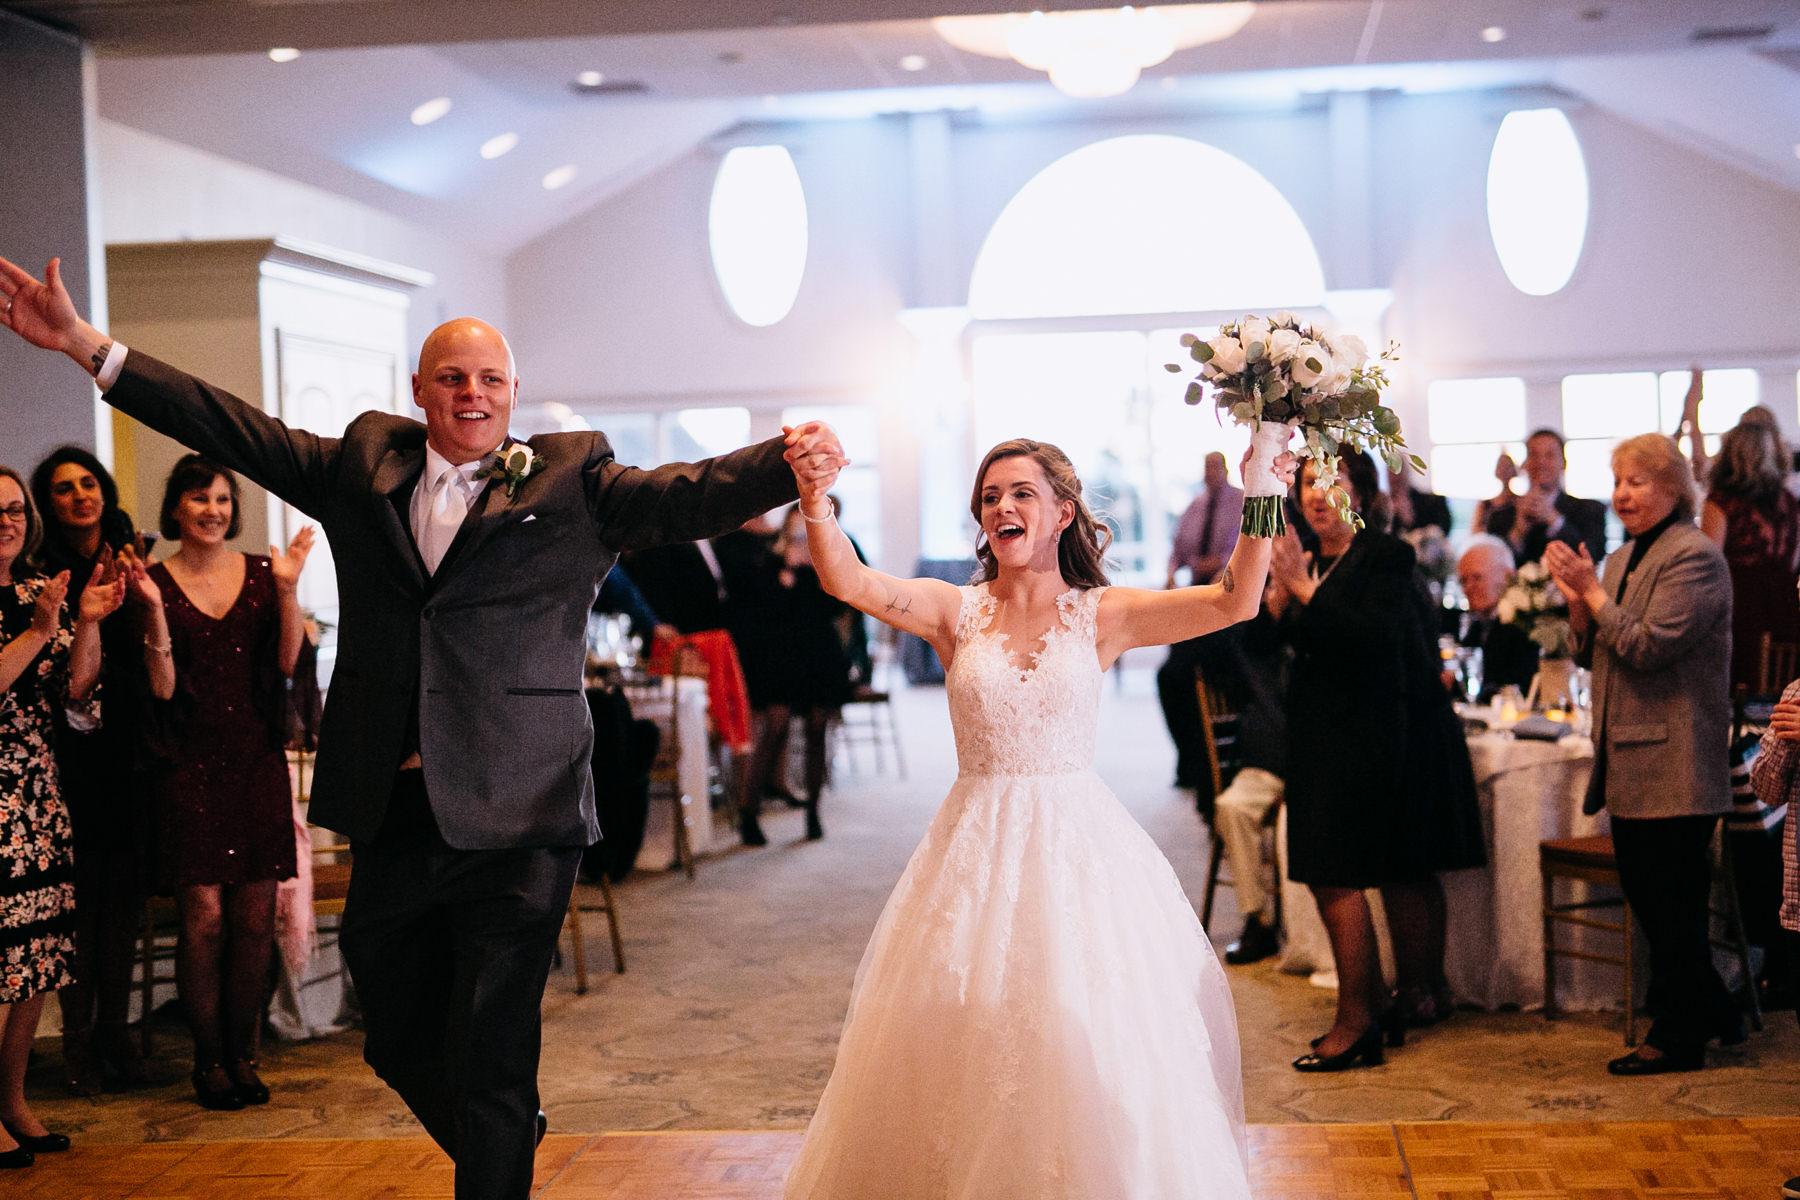 Quincy Ma Massachusetts Wedding Dedham Boston Granie Links Wedding New England Catholic Cathedral Liz Osban Photography 85.jpg